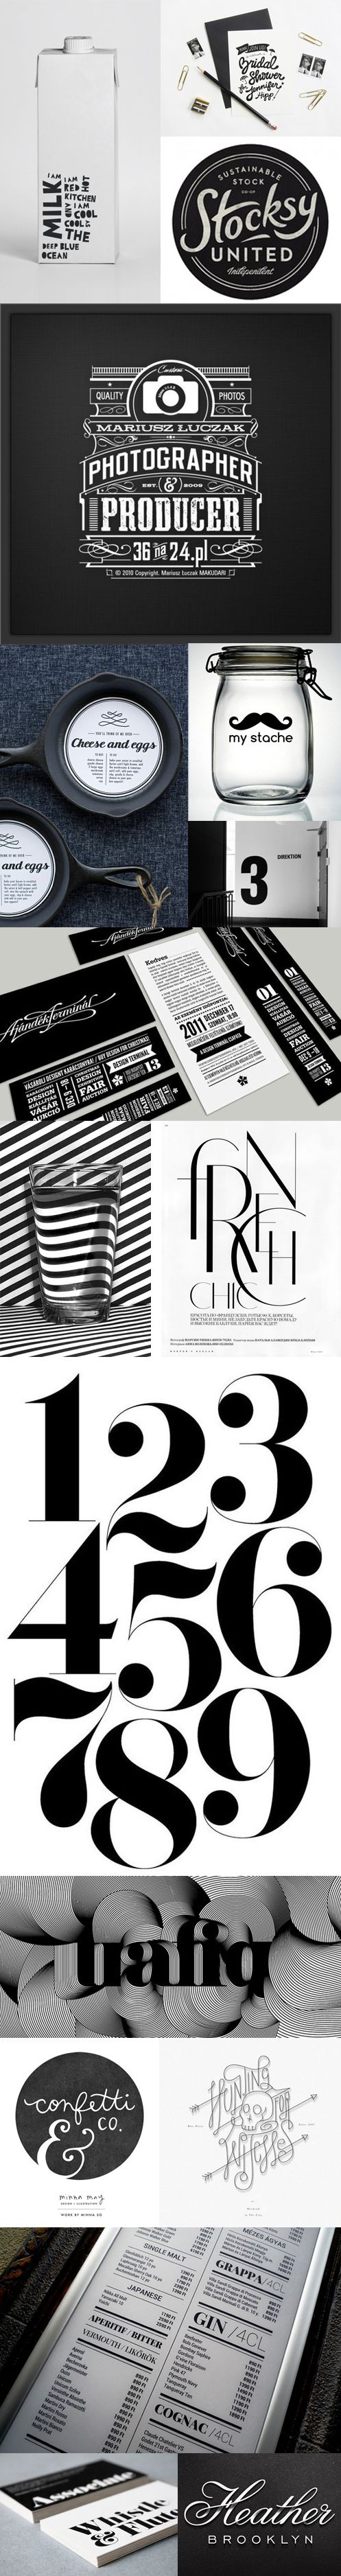 Black and White Design #Design #Collage #Black #White #Typography